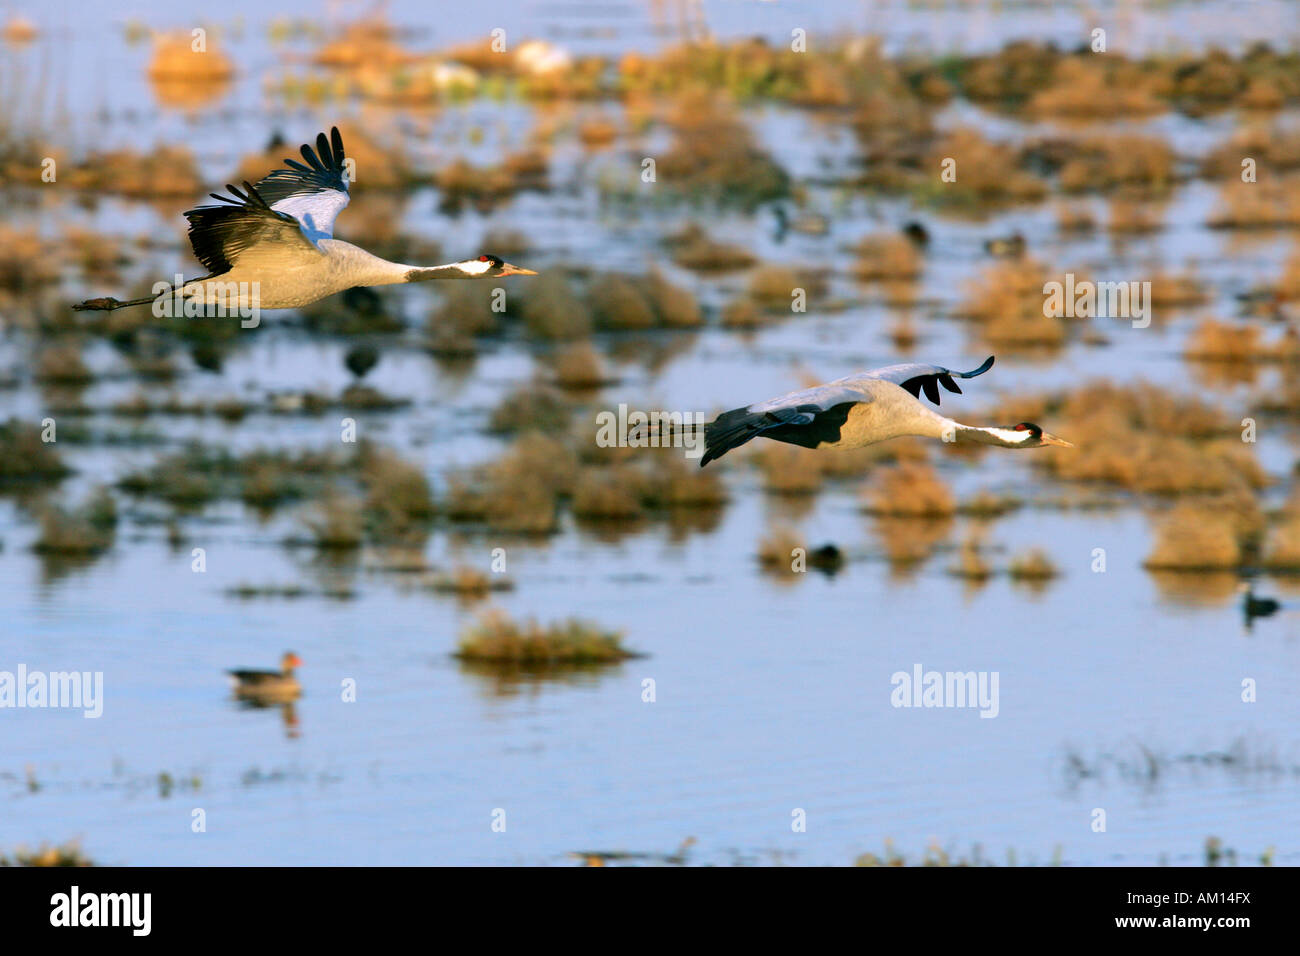 Couple of flying common cranes (Grus grus) in the morning light over the lake Hornborga - Sweden, Europe Stock Photo